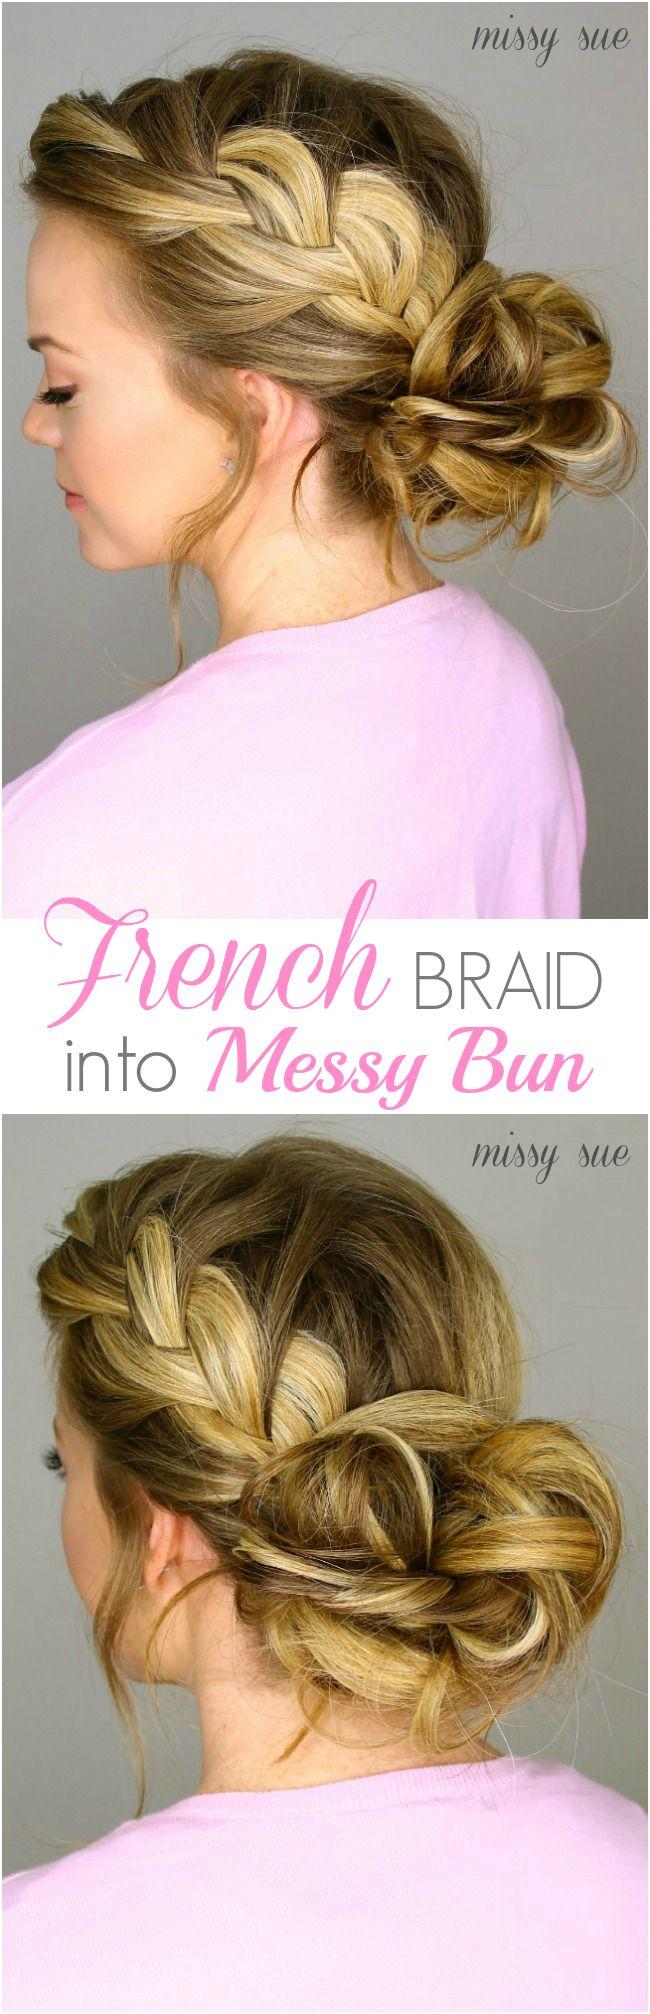 French Braid into Messy Bun